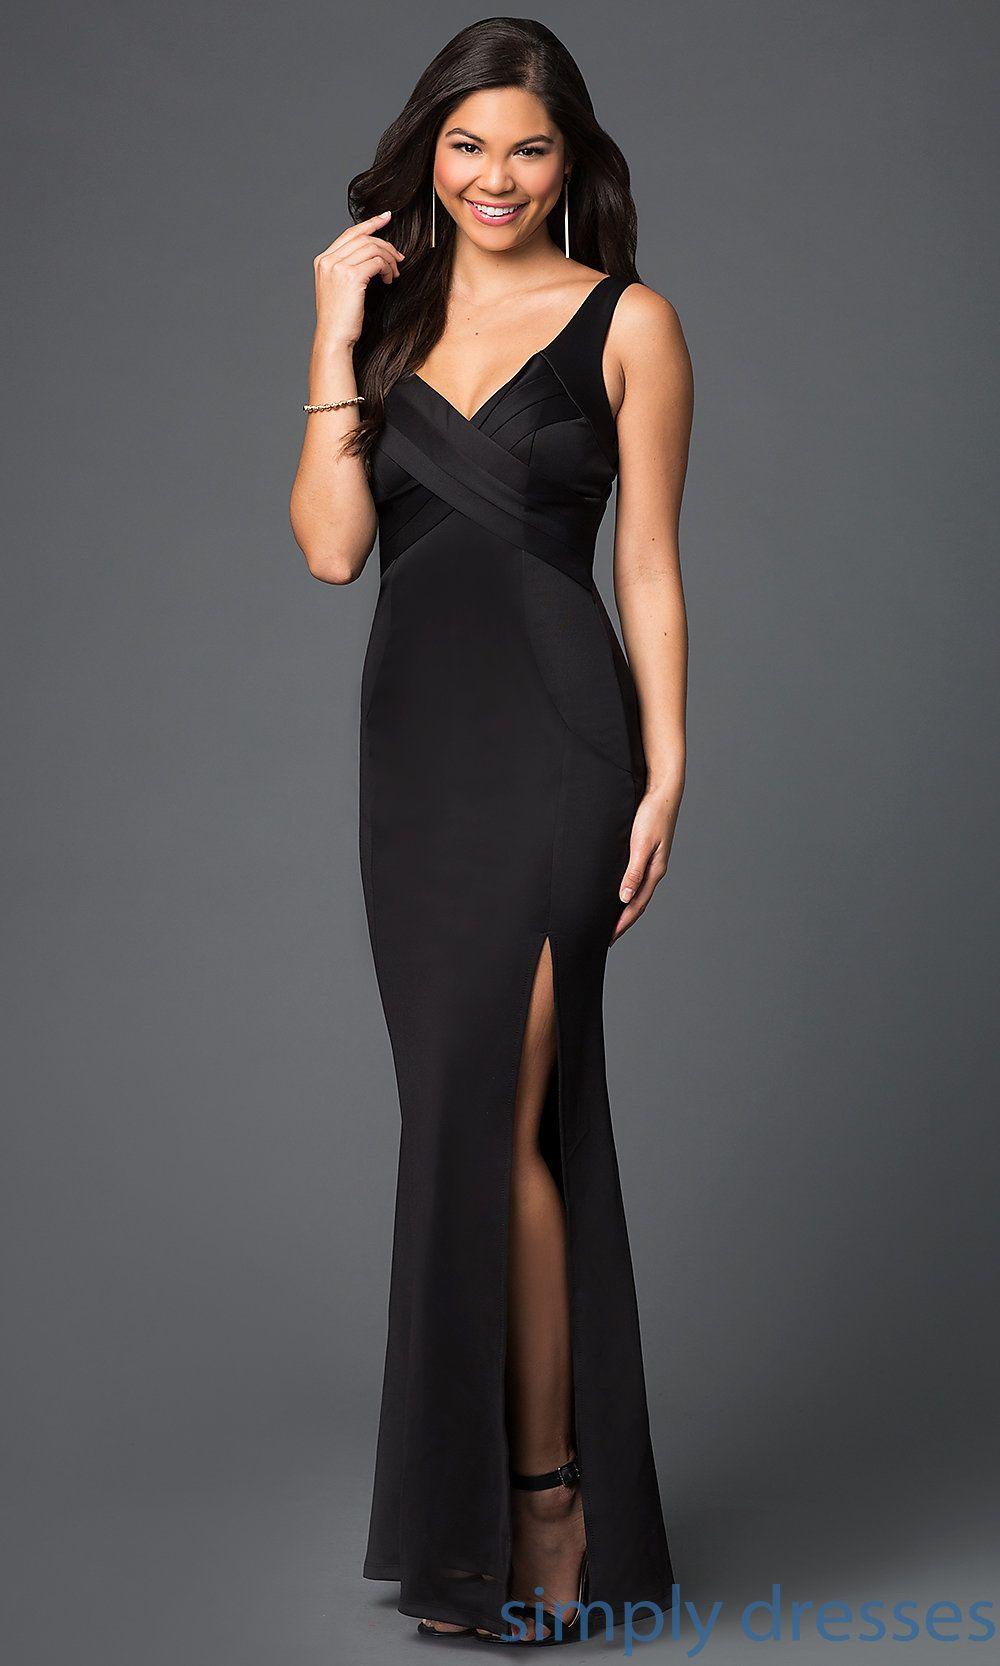 Black Jersey V Neck Evening Dress with Long Front Slit | Dress ...